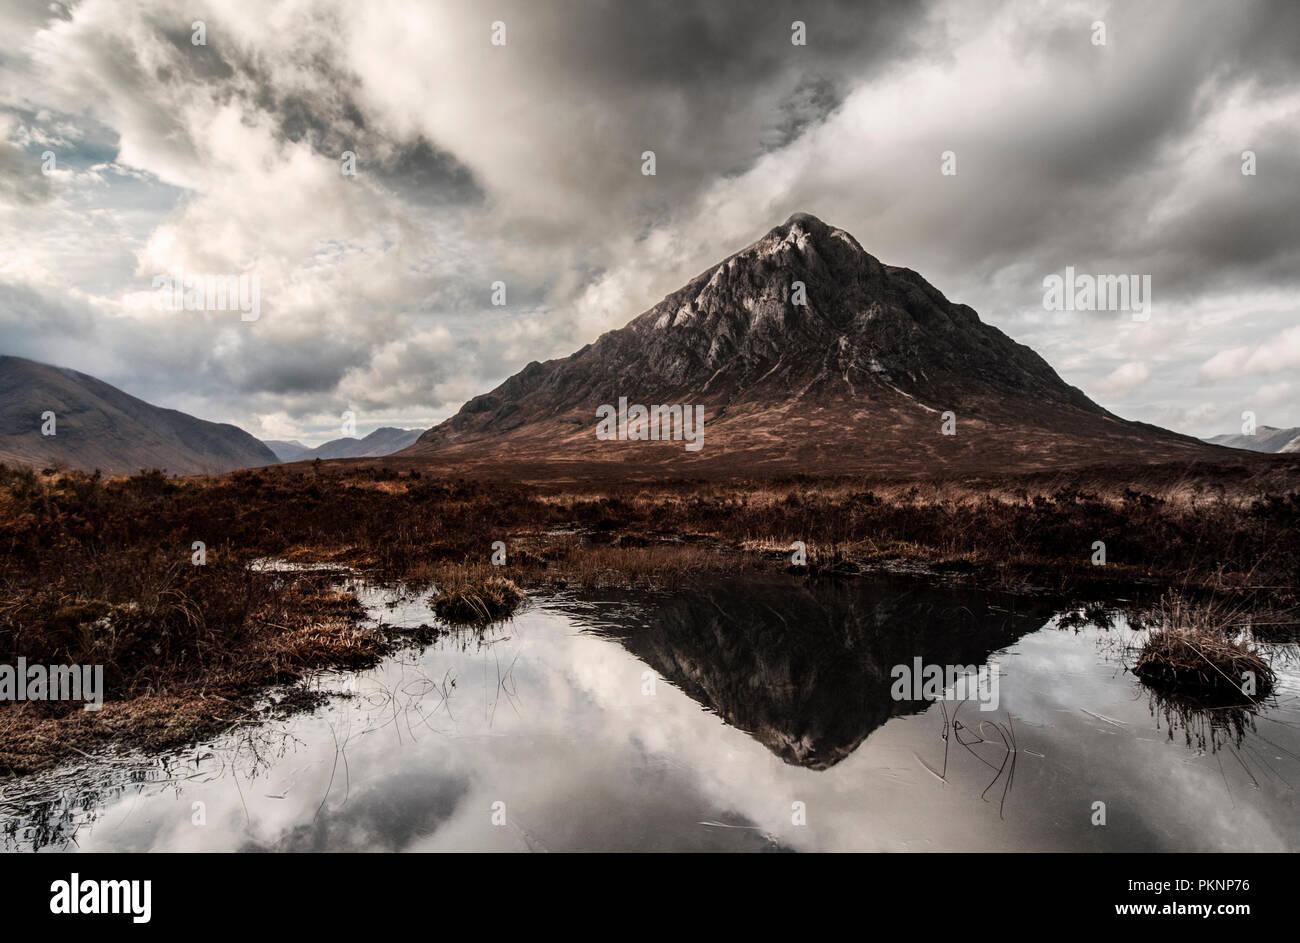 Buachaille Etive Mor Reflection in Loch, Glencoe Scotland - Stock Image